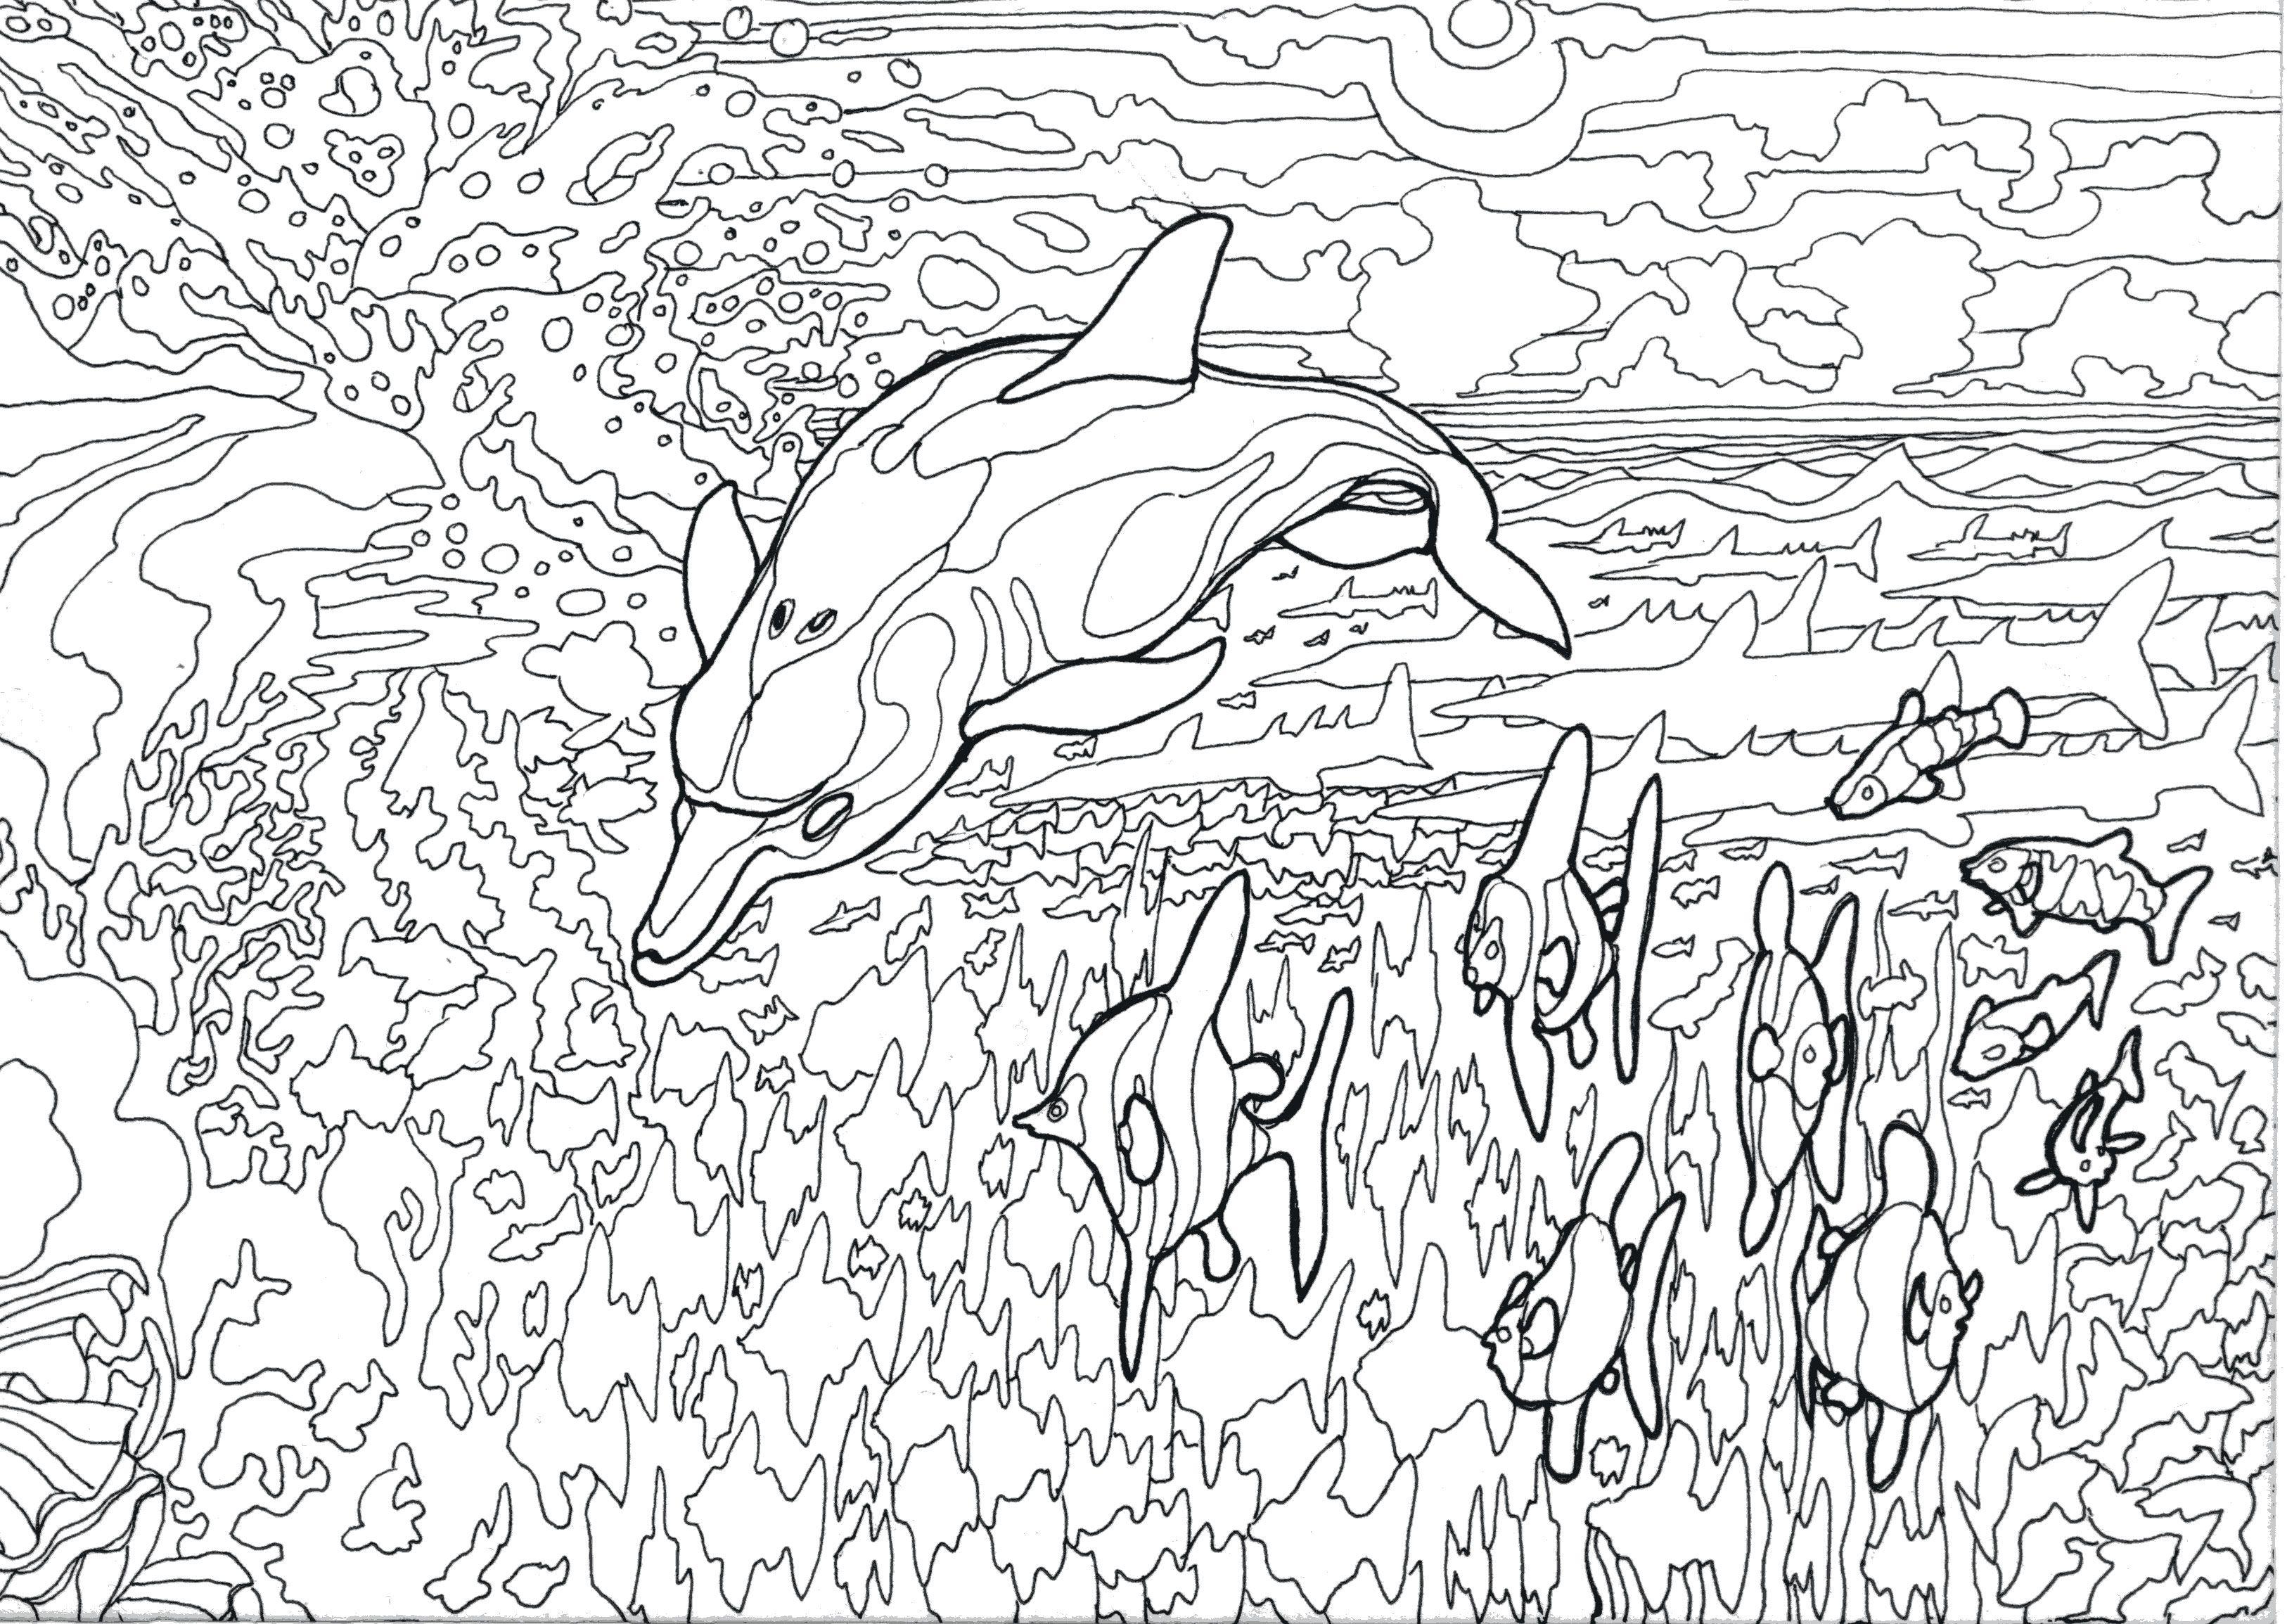 delfin dolphin art dessin arte dibujo marino blanco y negro olivier martinet oliviermartinetart